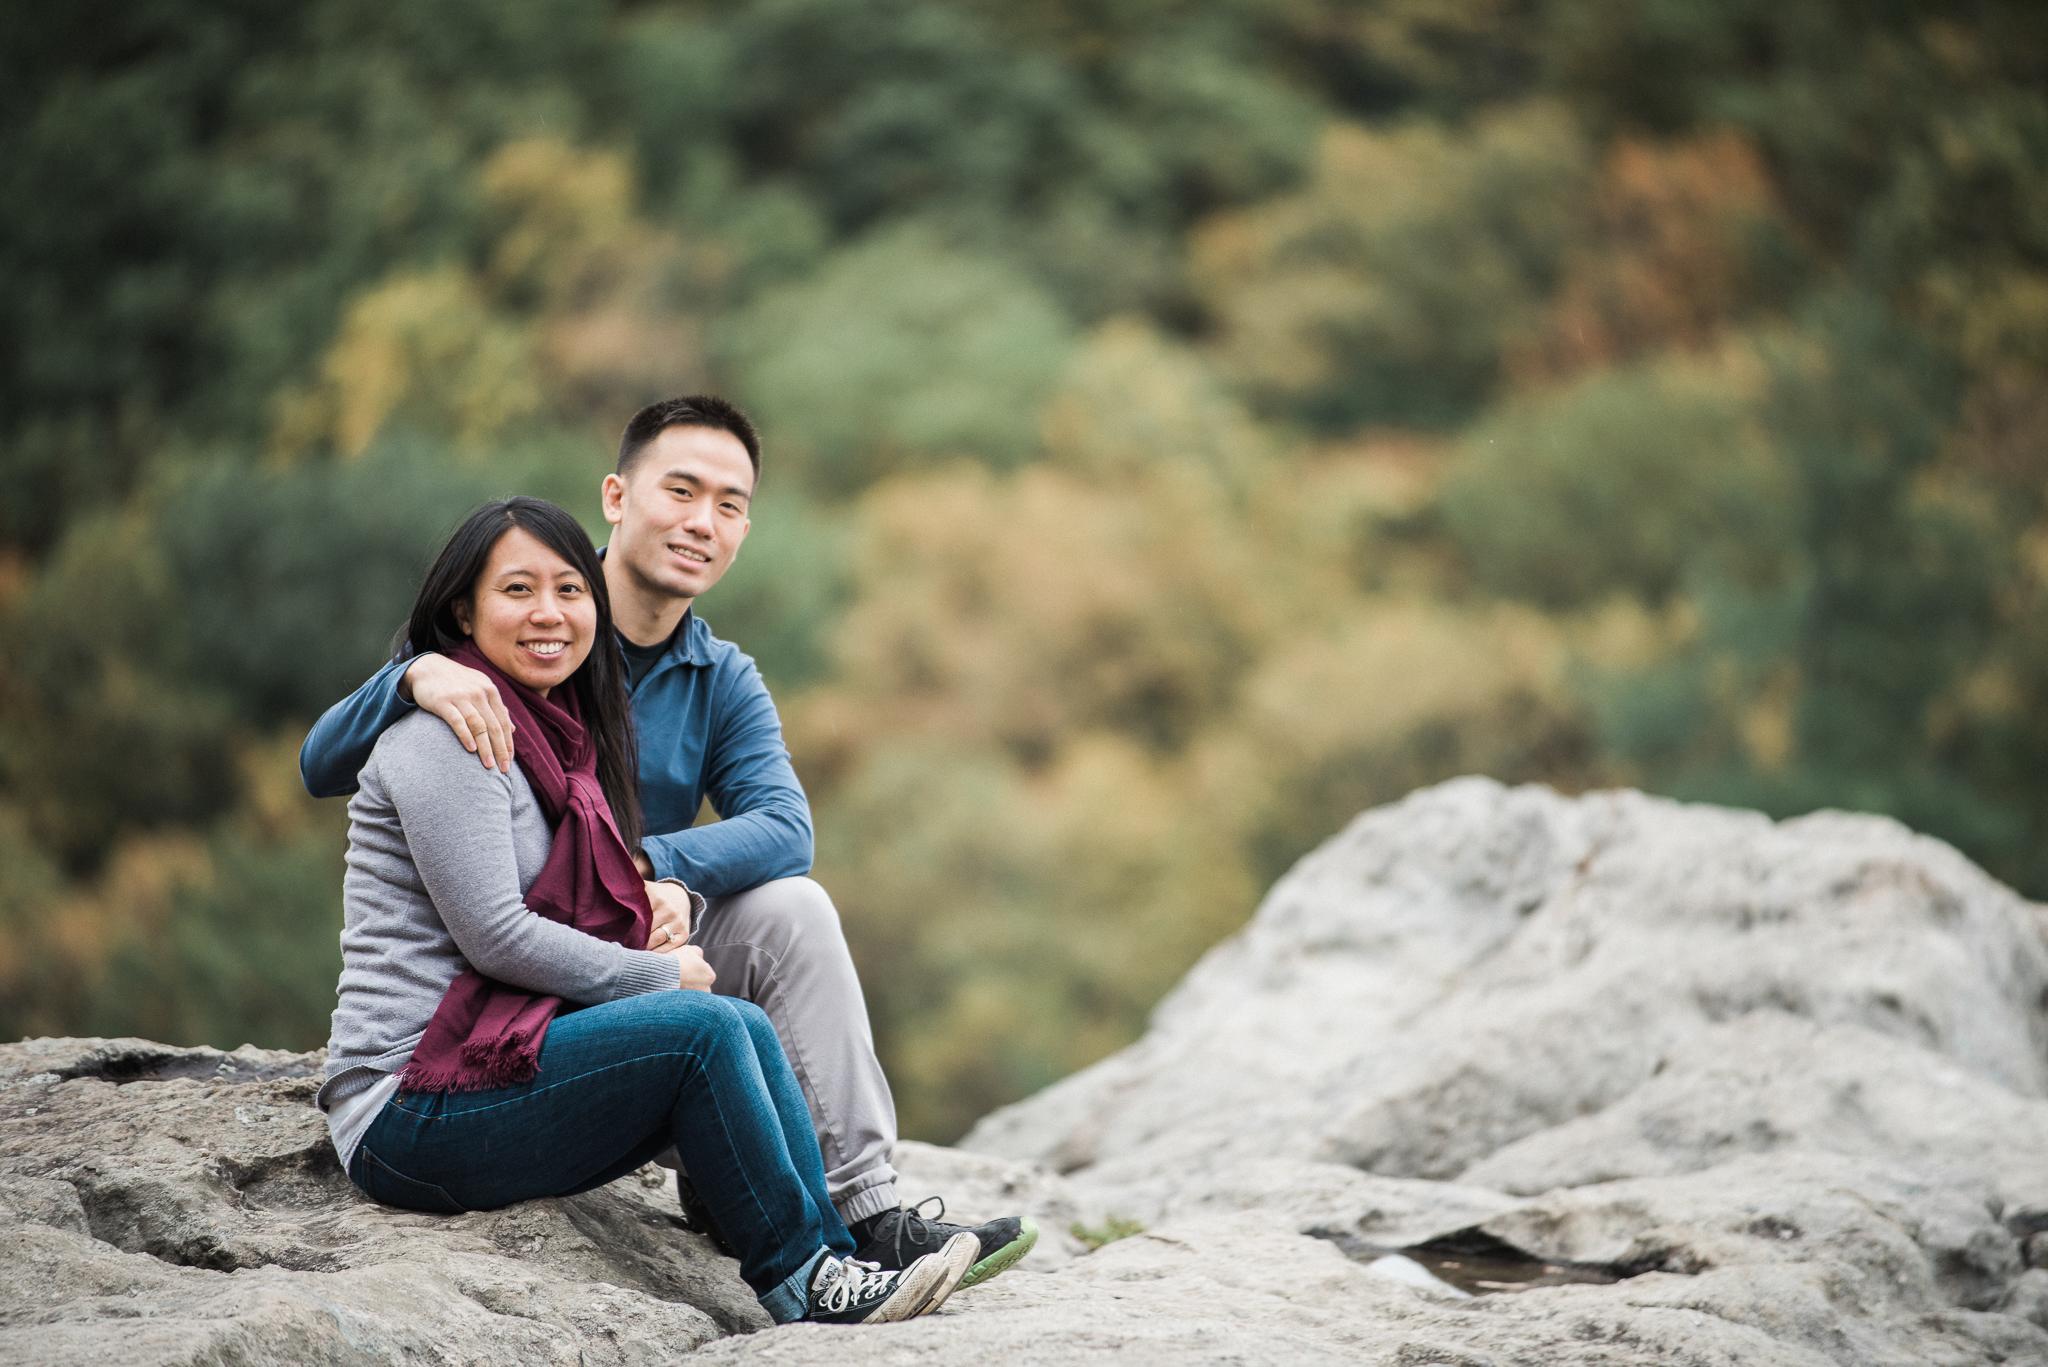 hiking engagement photos engagement photography washington dc wedding planner sincerely pete